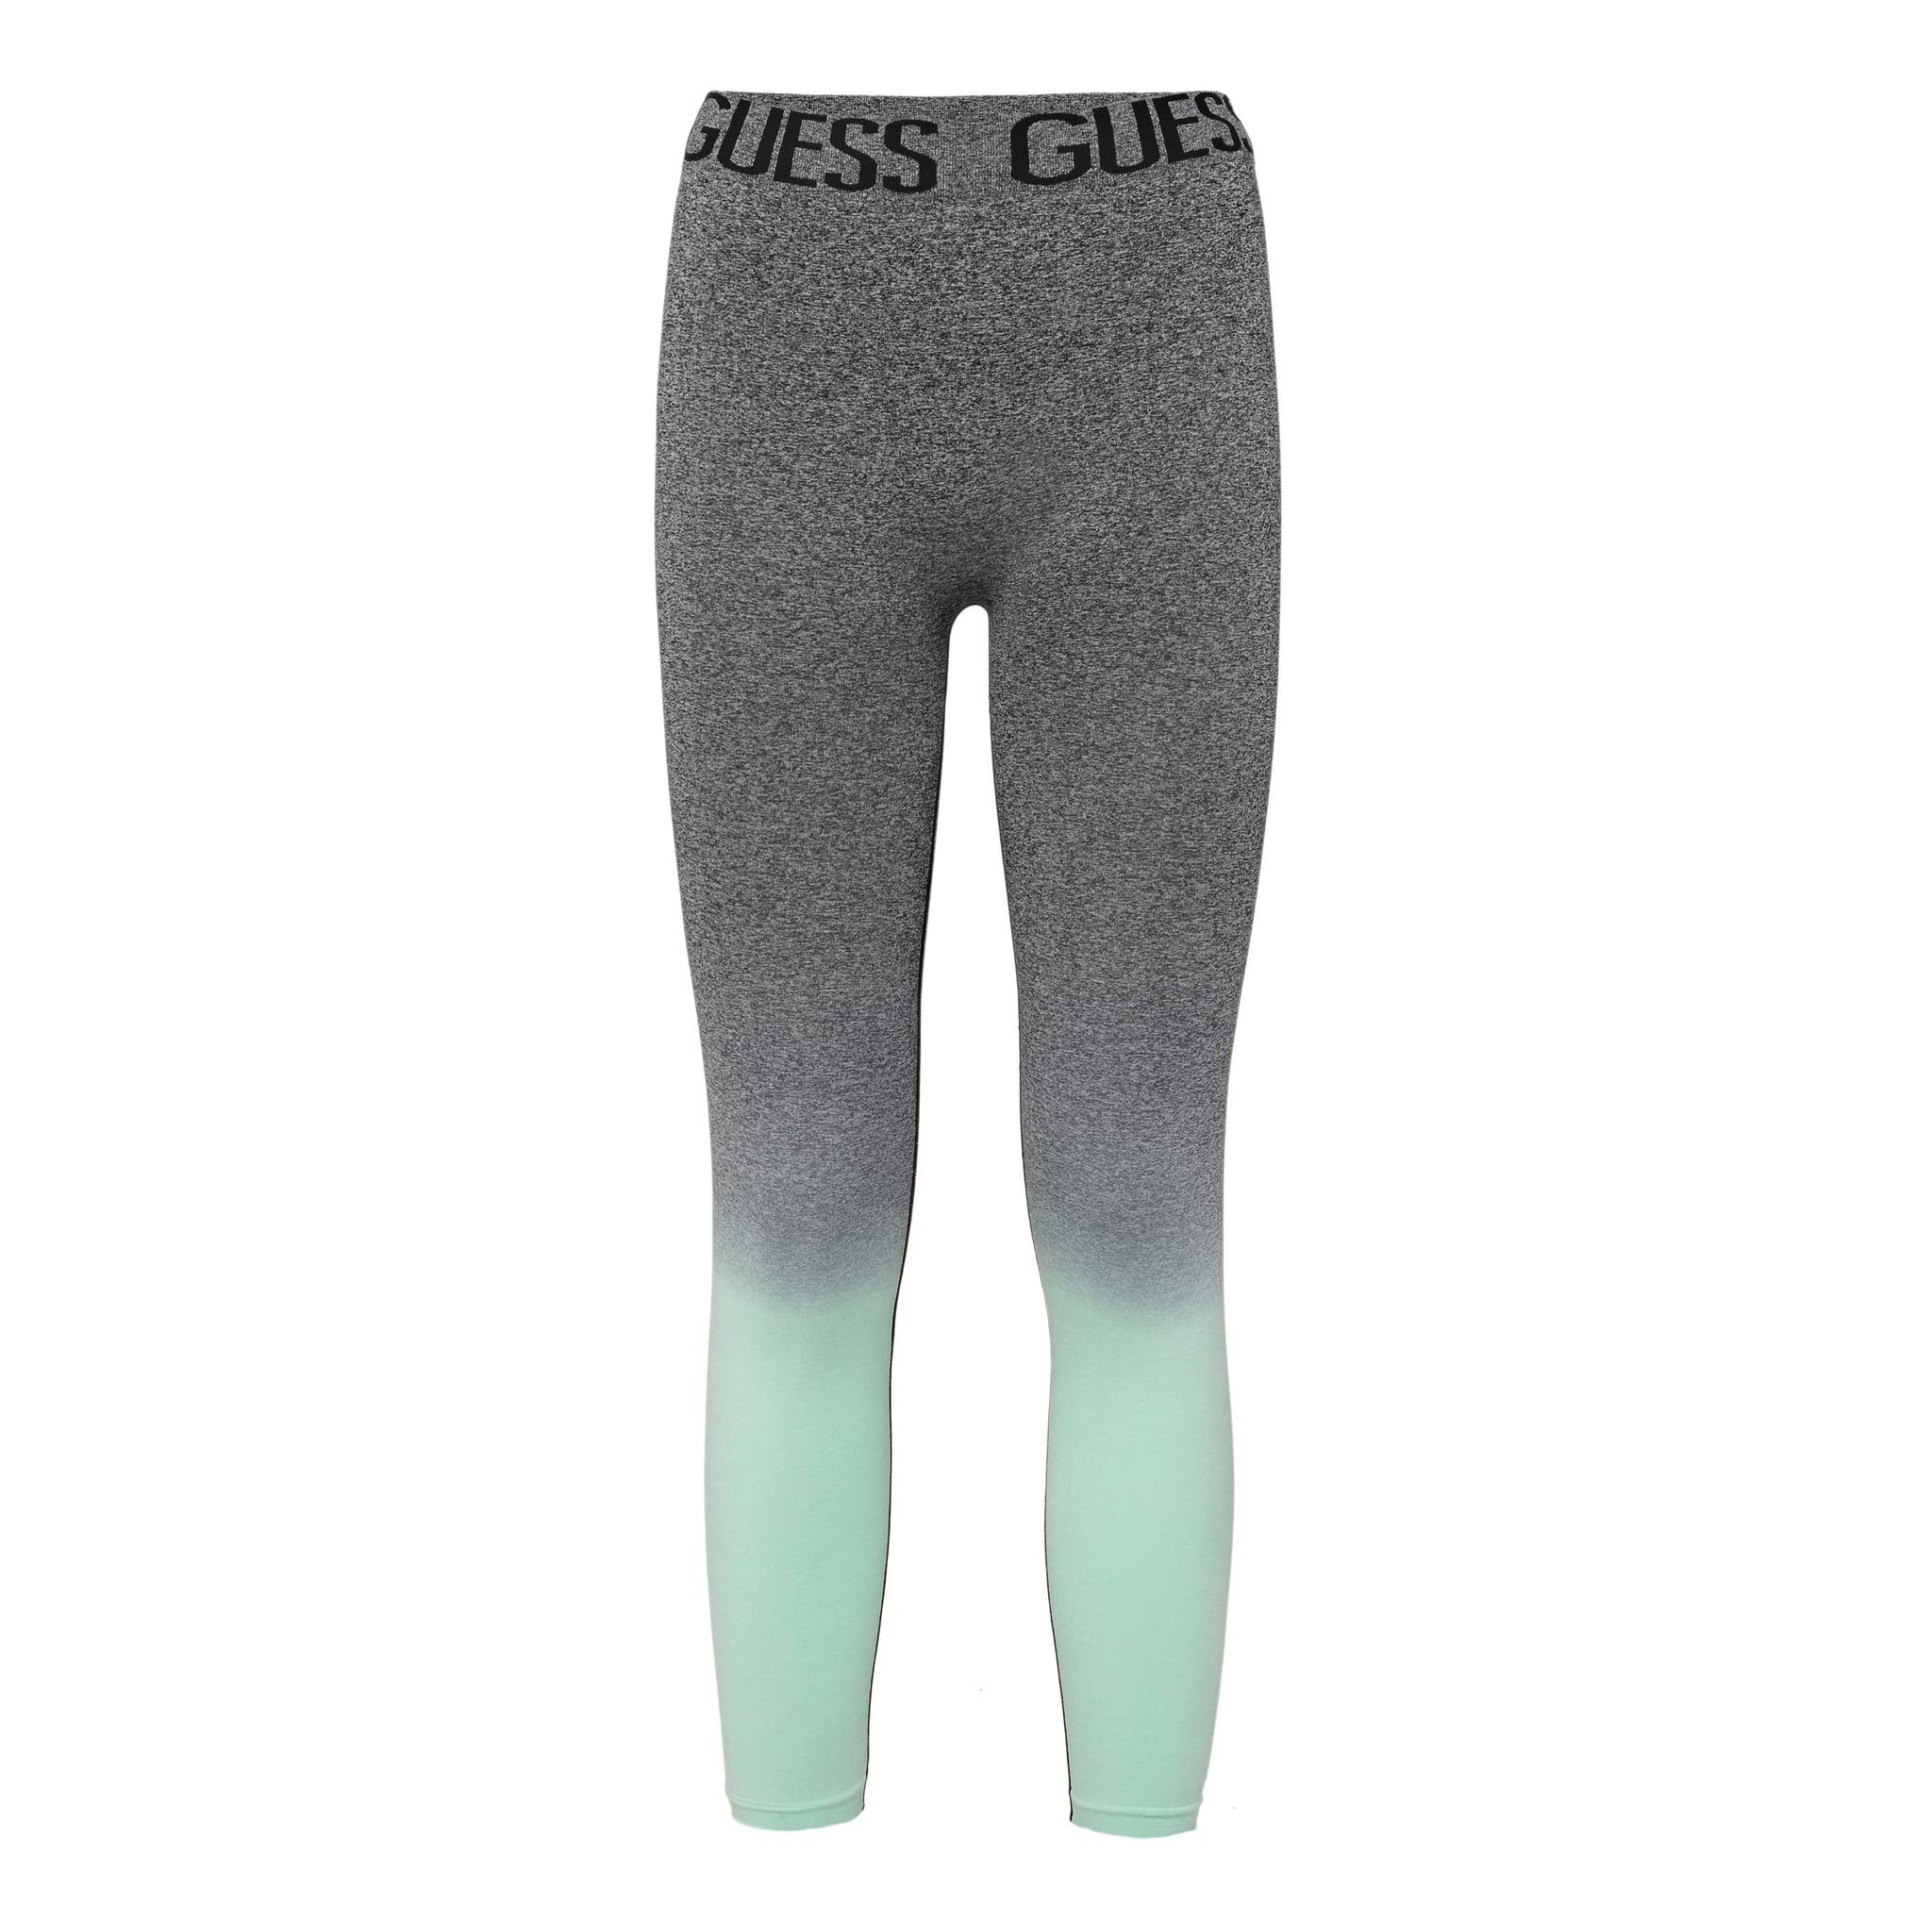 Cerny leggings amanda Amanda Cerny